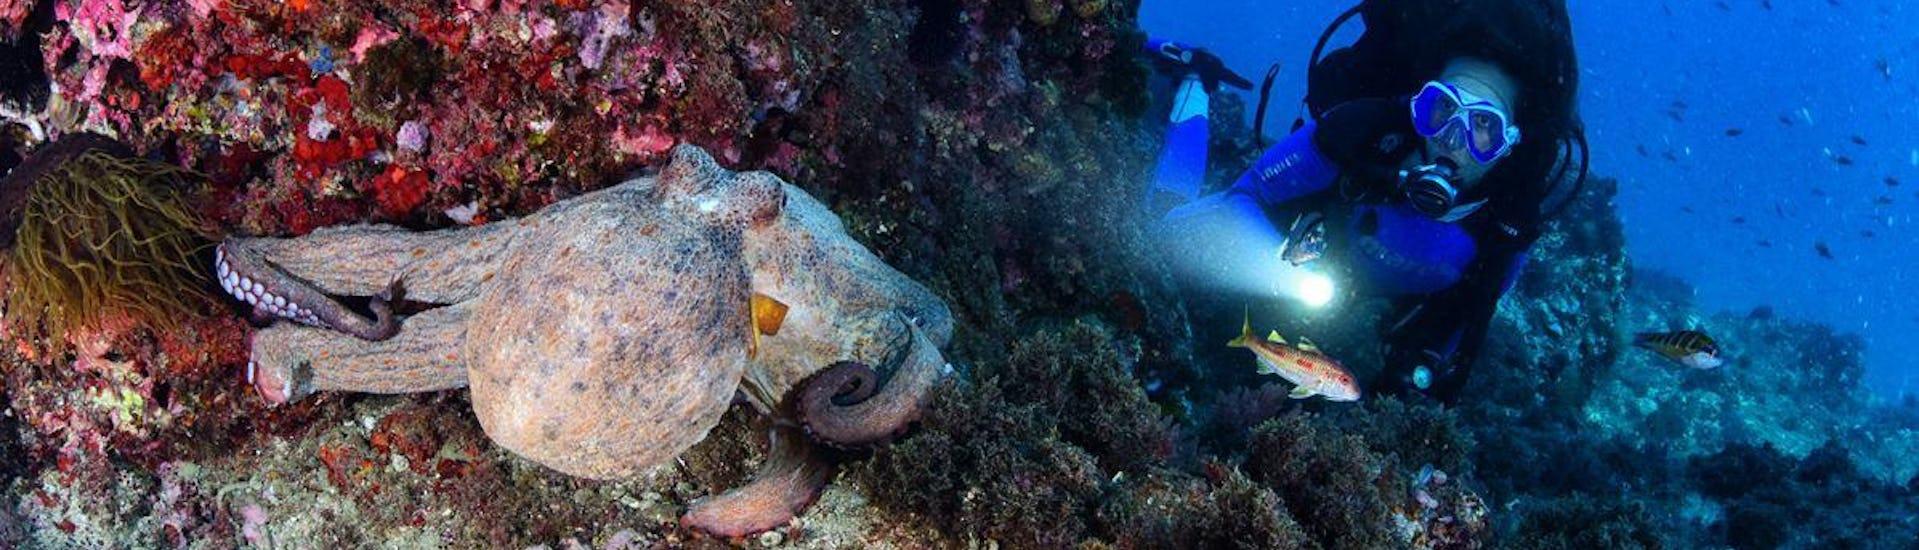 naui-passport-diver-course-on-pag-for-beginners-foka-diving-centar-simuni-hero